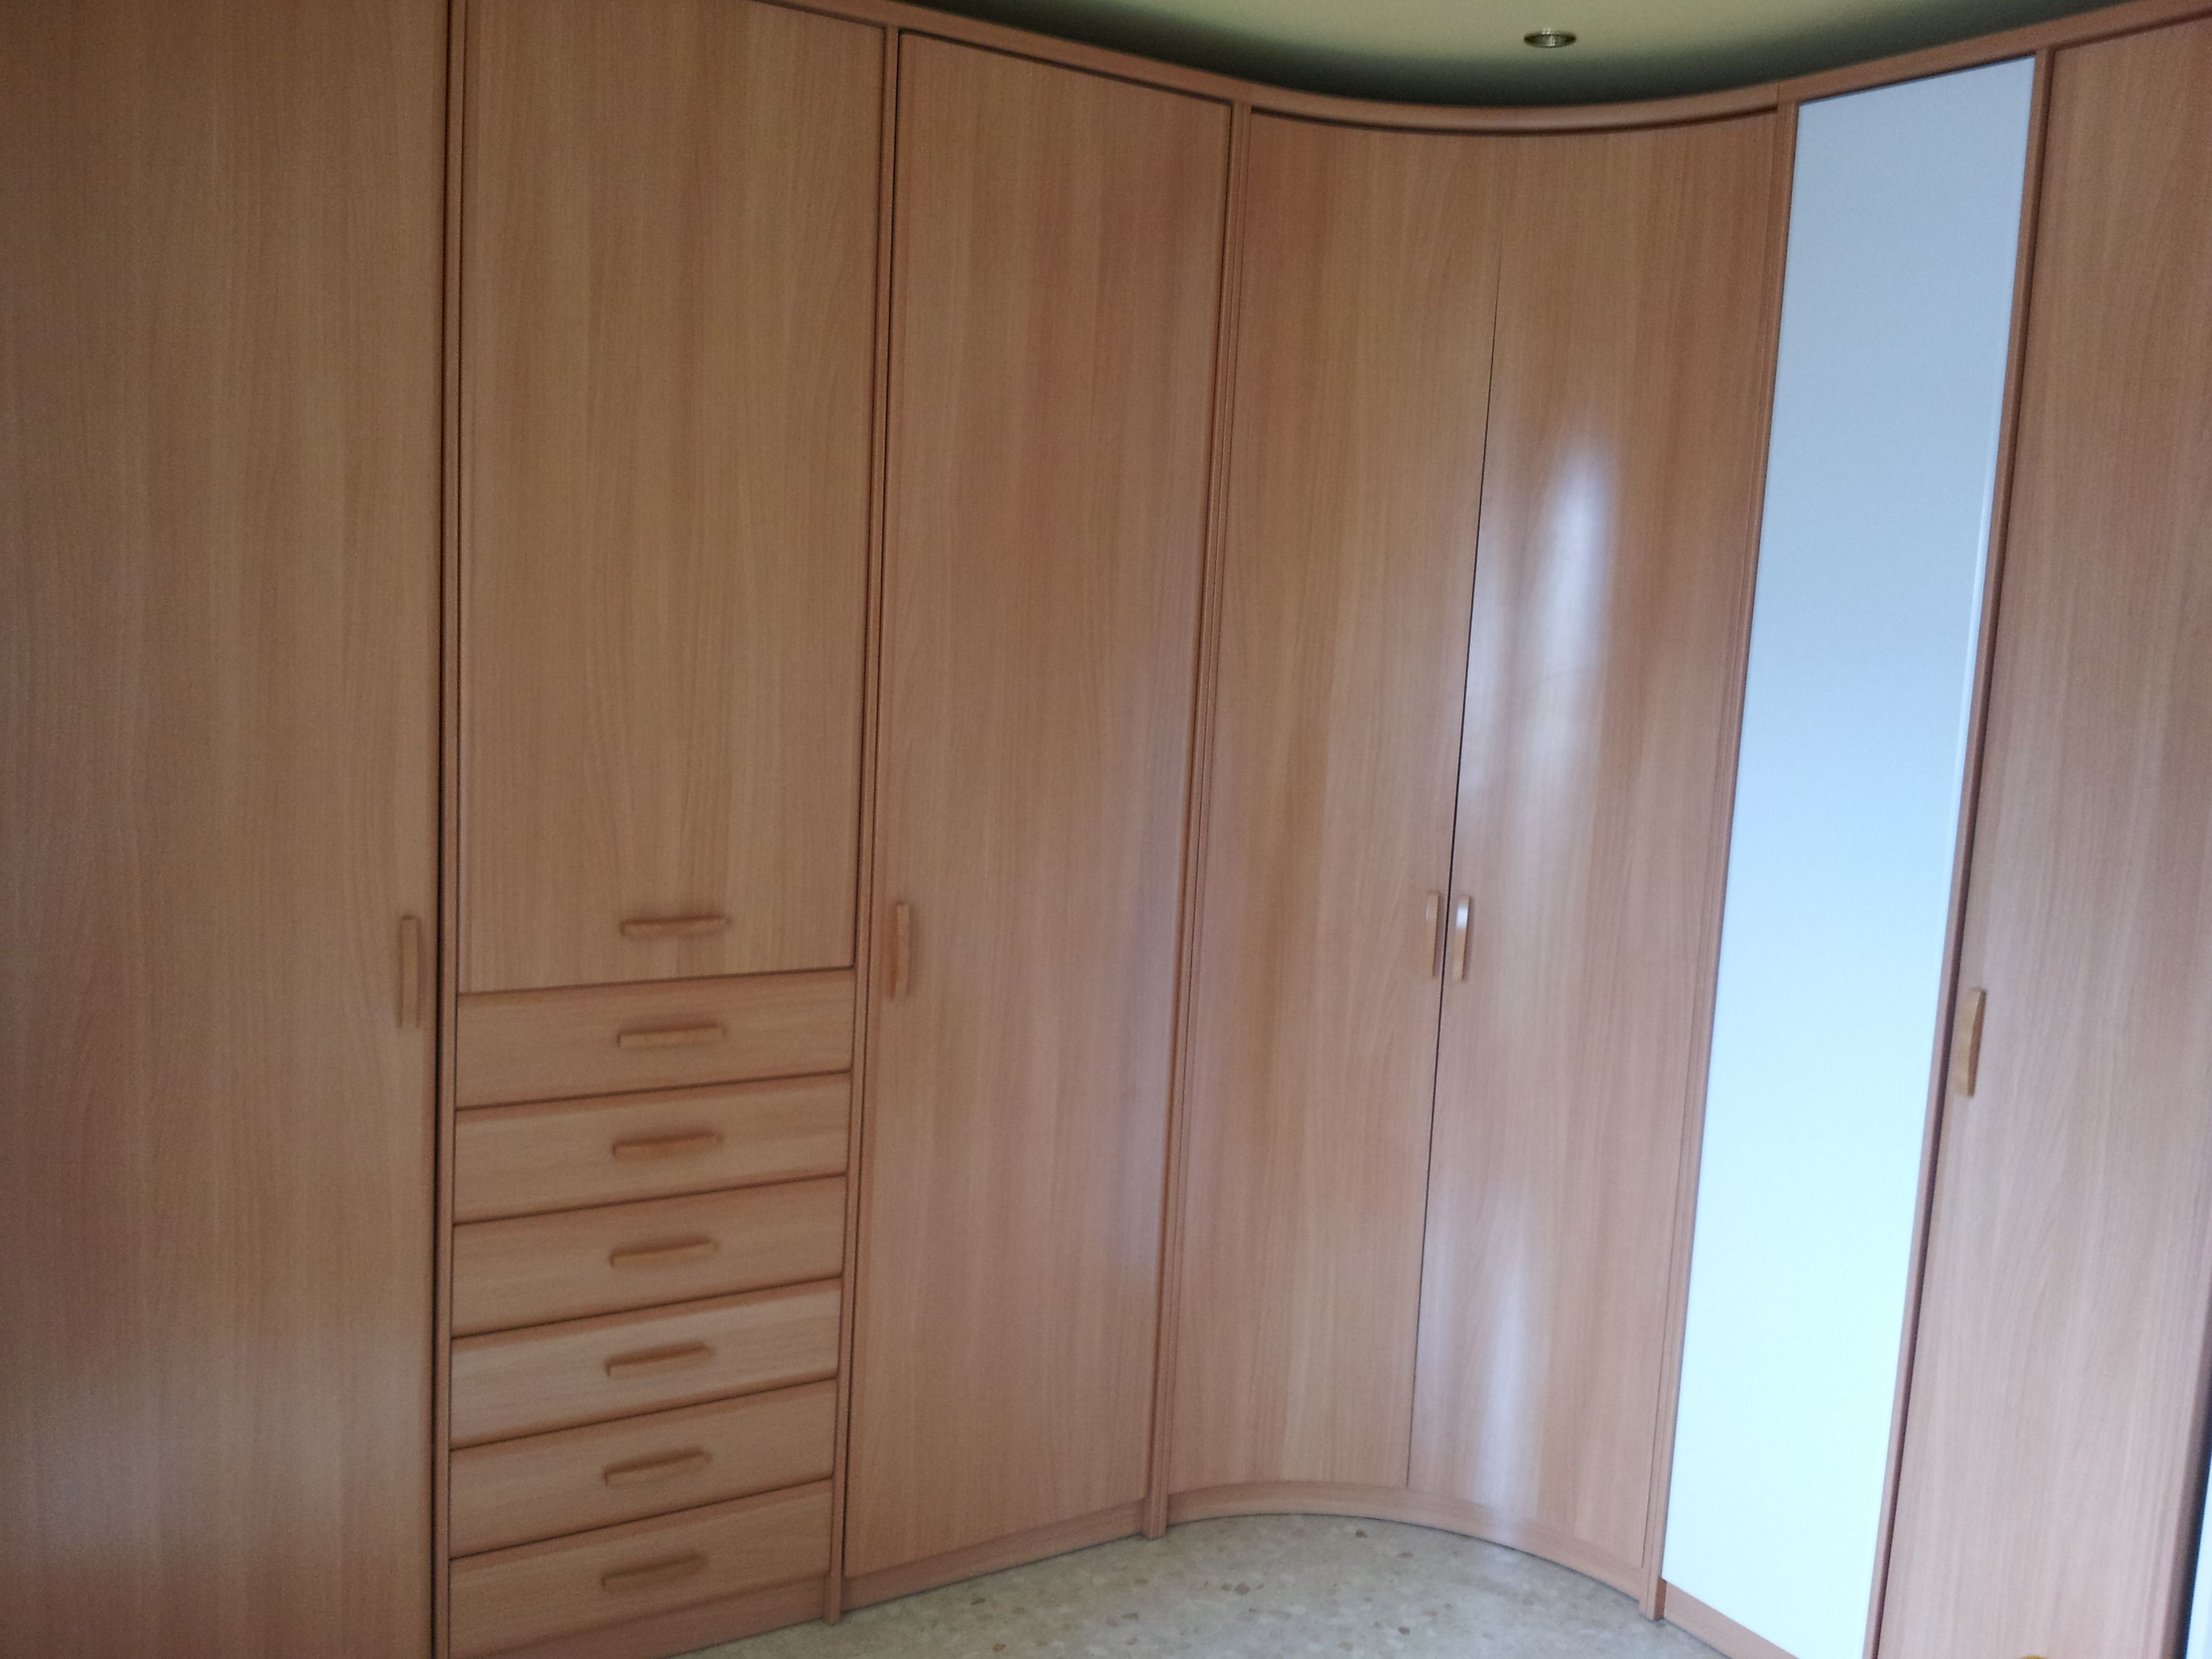 Moderno Muebles De Cocina Pintura Blanca De Costes Colección de ...